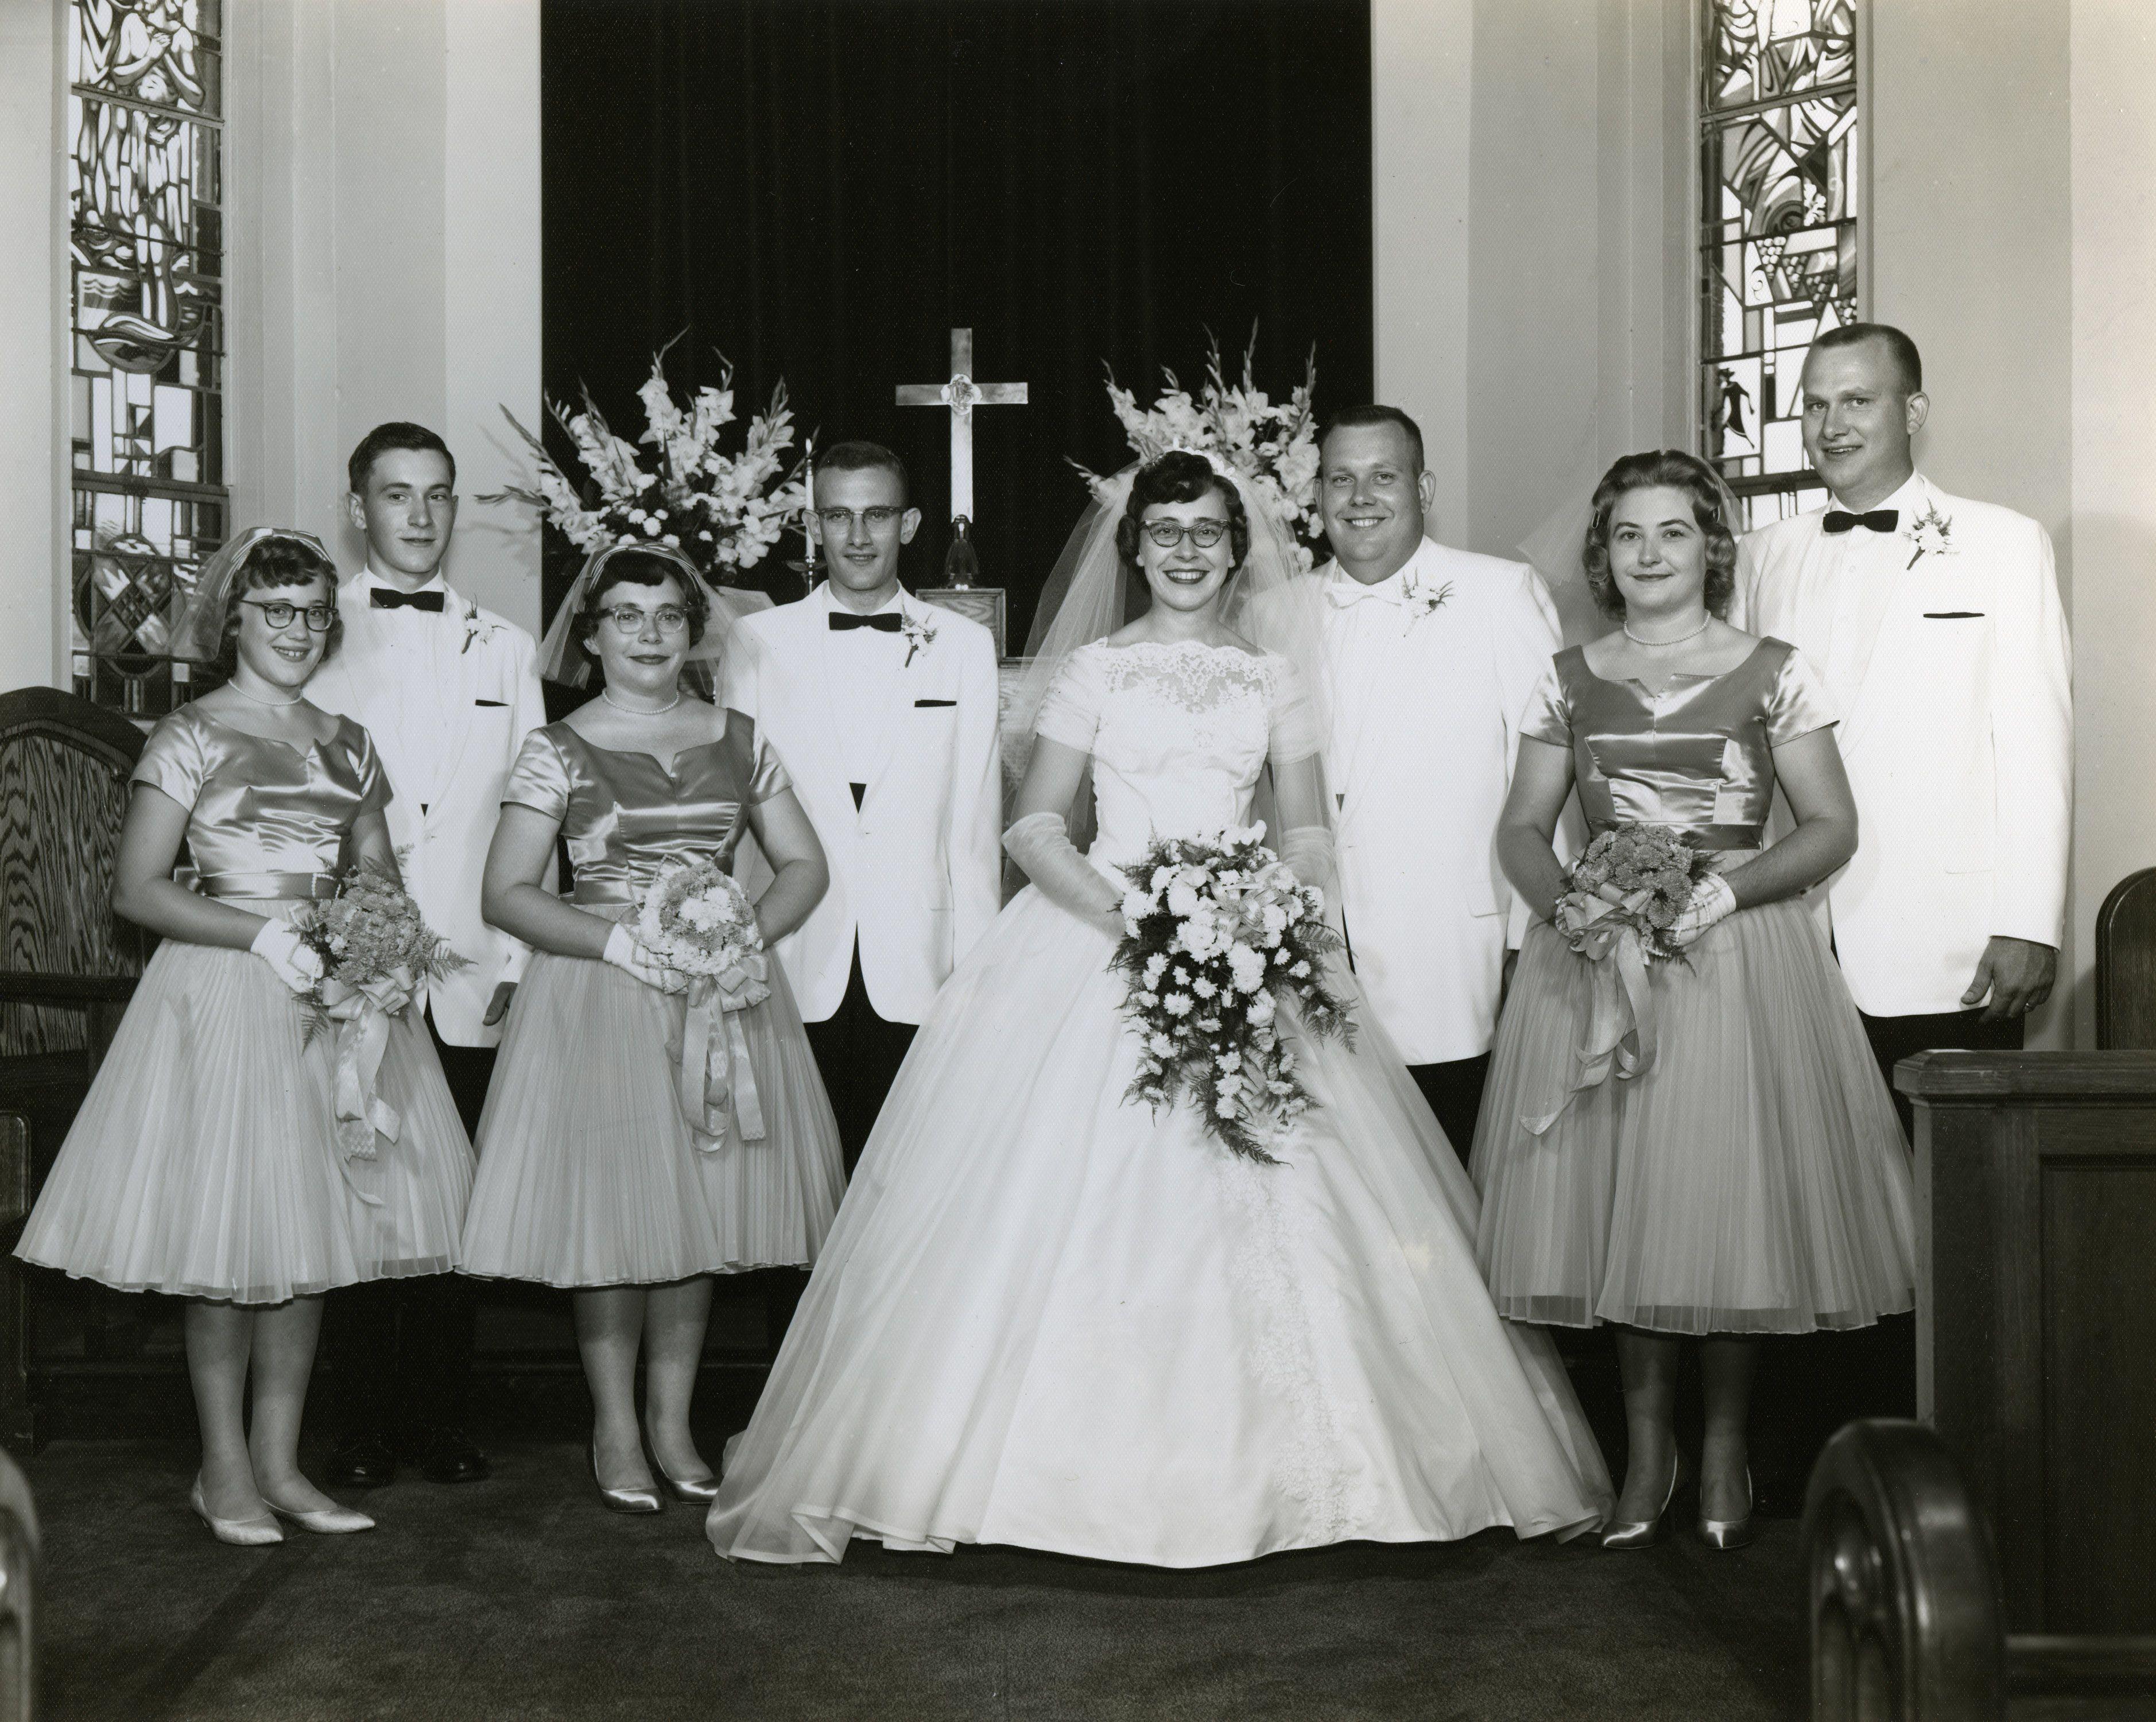 1960 wedding dresses  Pin by Barbara Baxter on Vintage Wedding Dresses  Pinterest